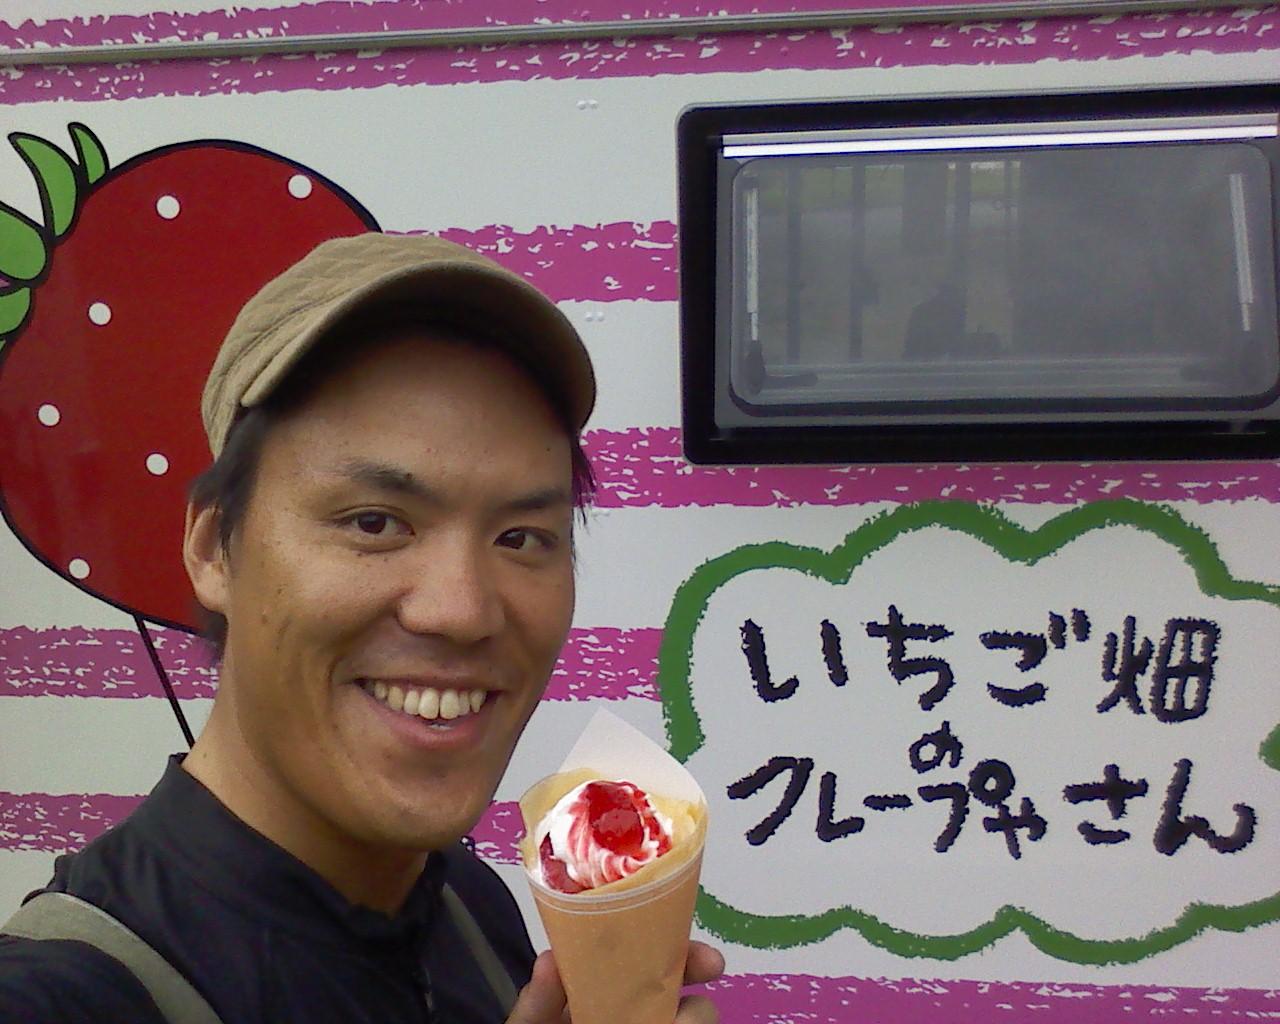 Nonhoi strawberry farm's director Mitsuhiro Mizutani